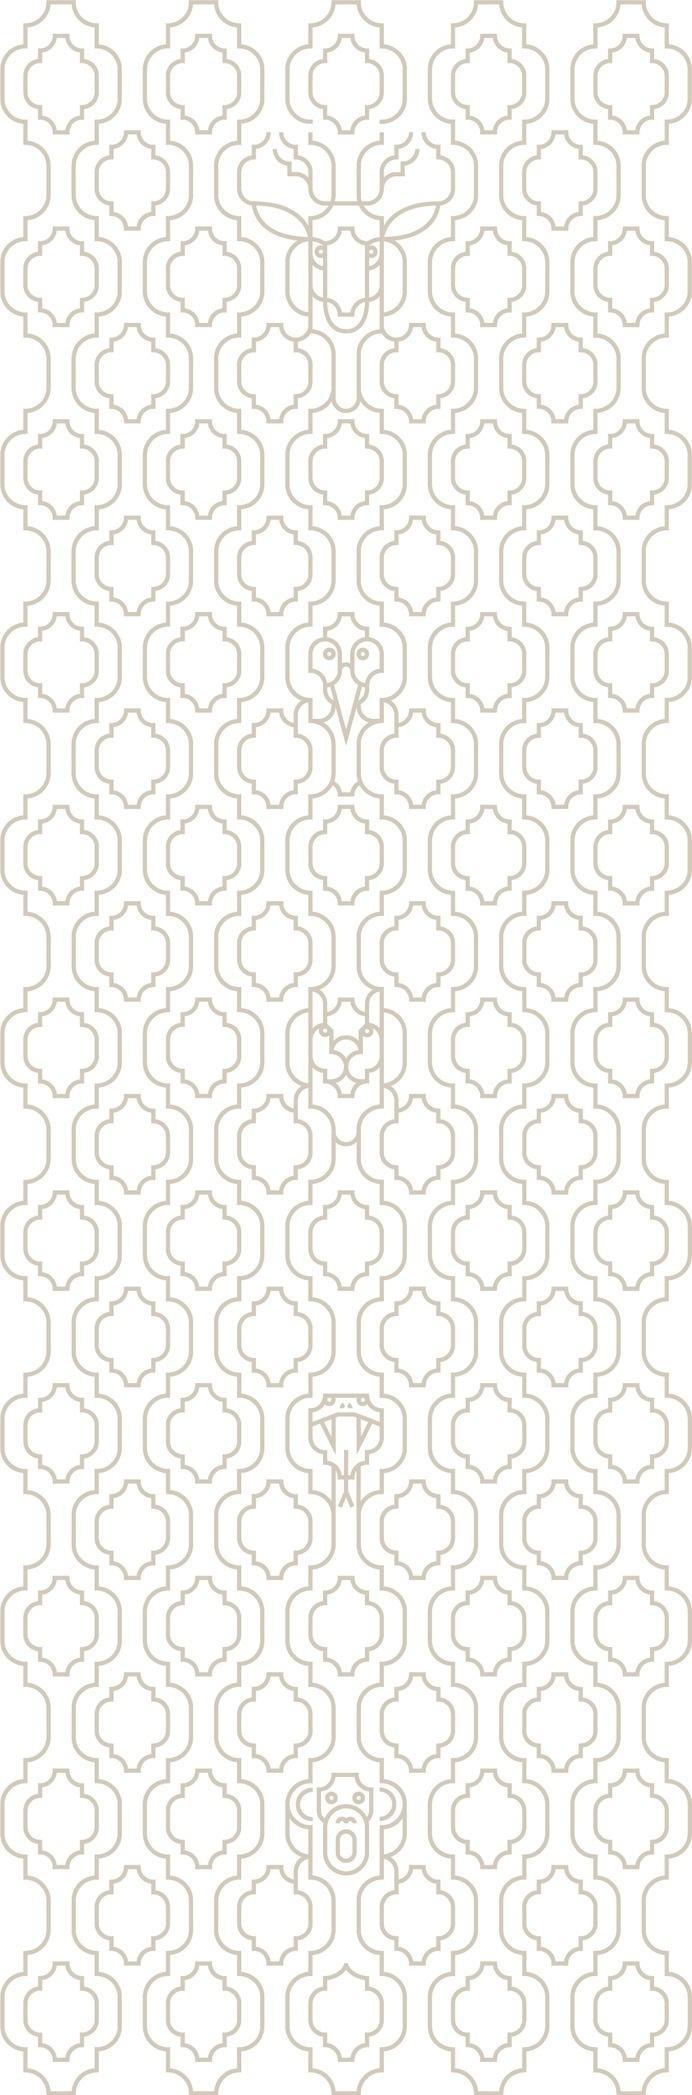 Moroccan Wallpaper by Mark Wilson #moroccan #wallpaper #pattern #antelope #snake #monkey #hidden #illusion #repeating #trellis #biomorphic #